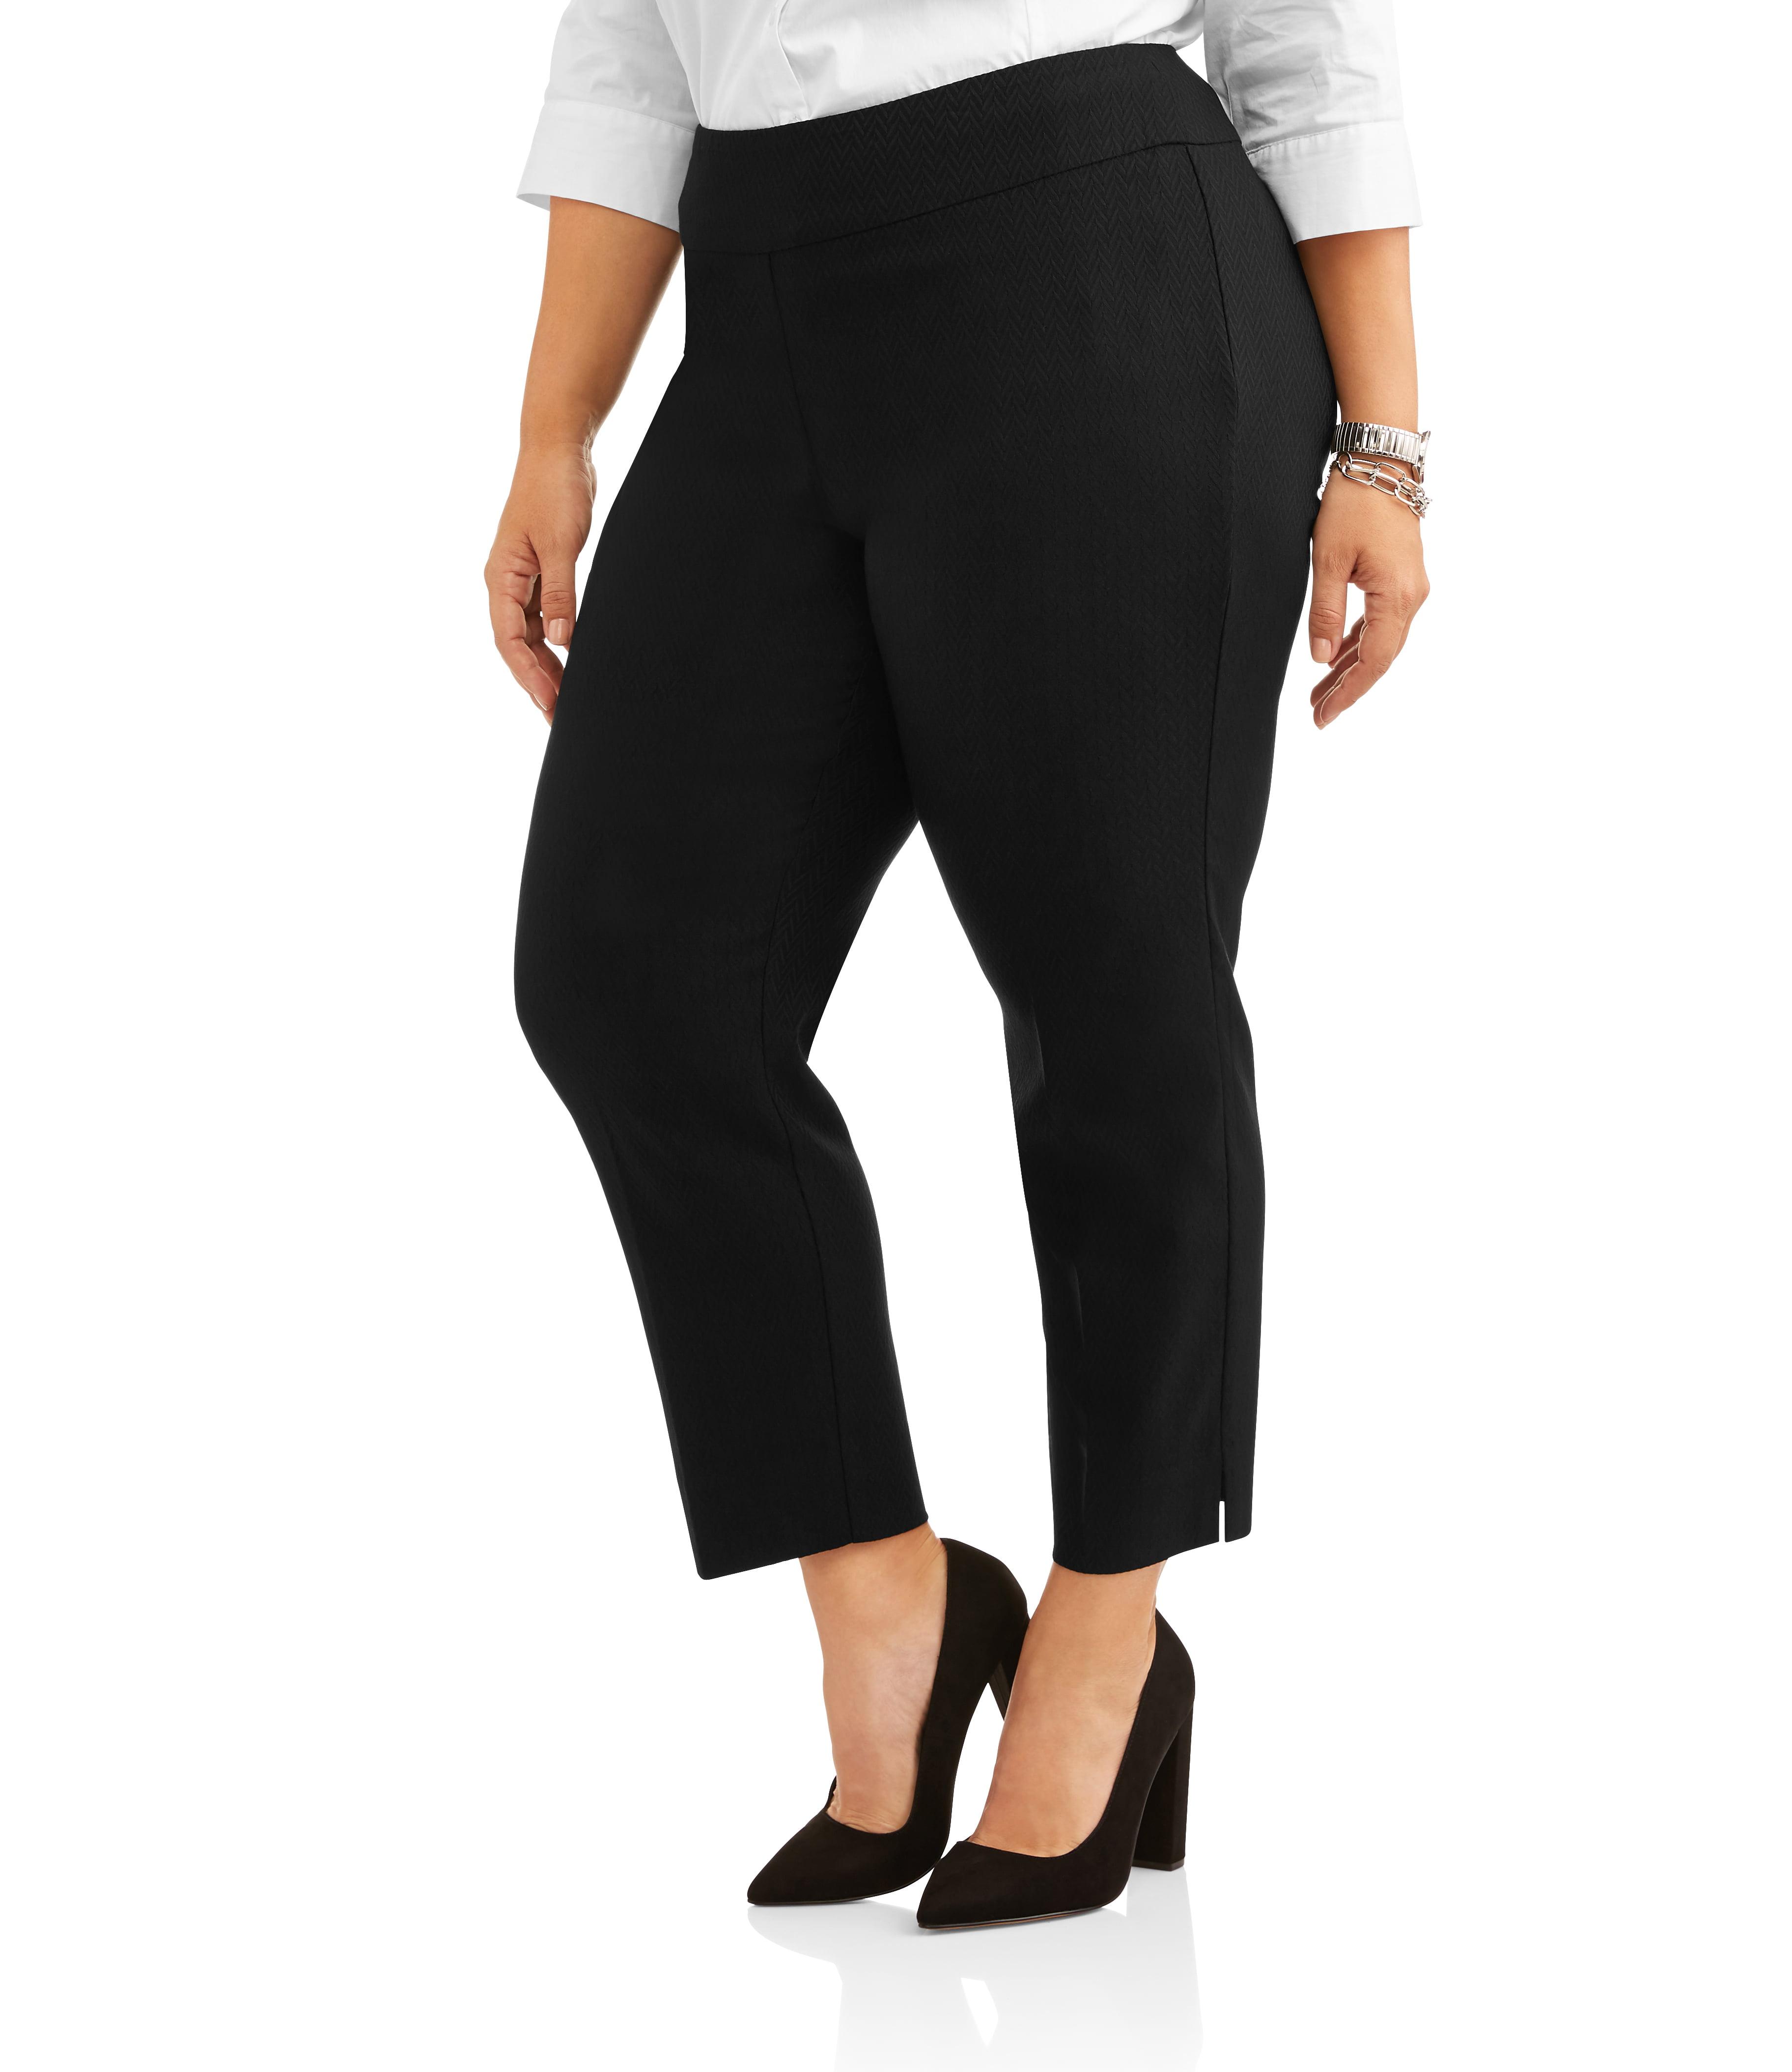 Lifestyle Attitudes Women's Plus Ankle Length Jacquard Stretch Career Pants